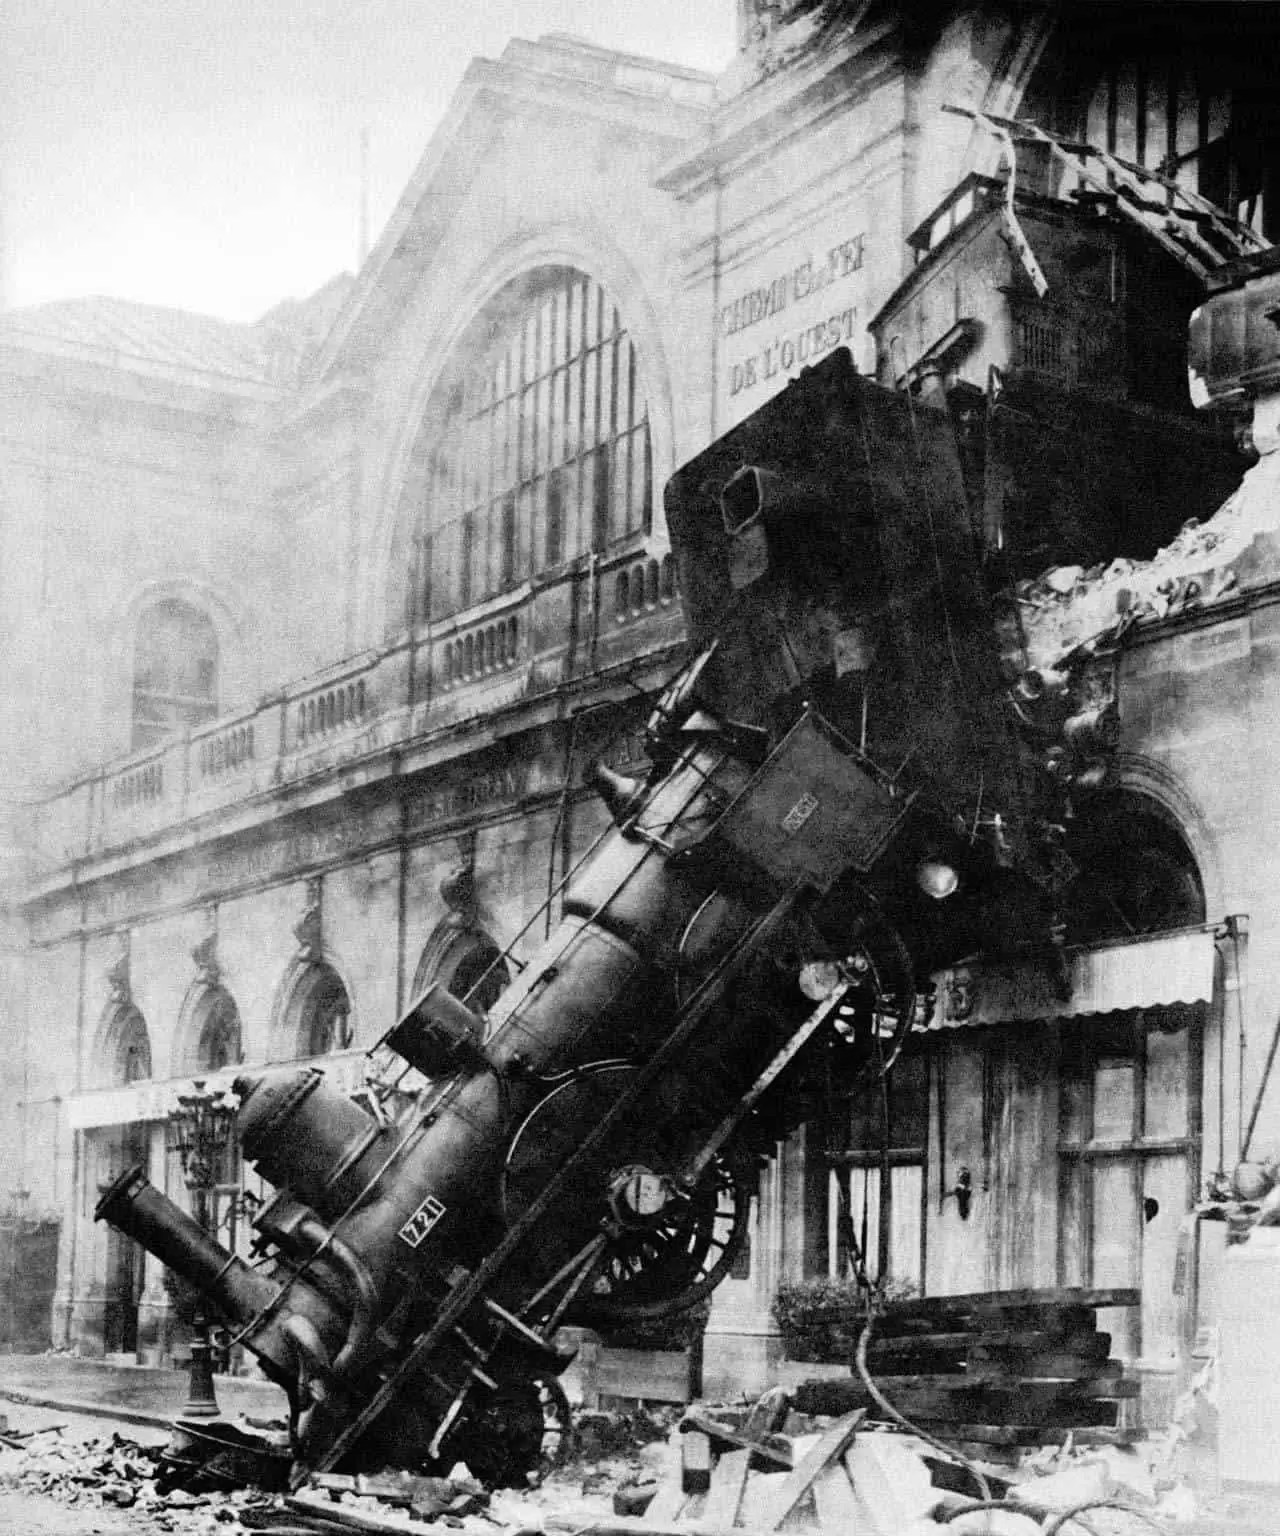 black and white photo of a failure, a train wreck